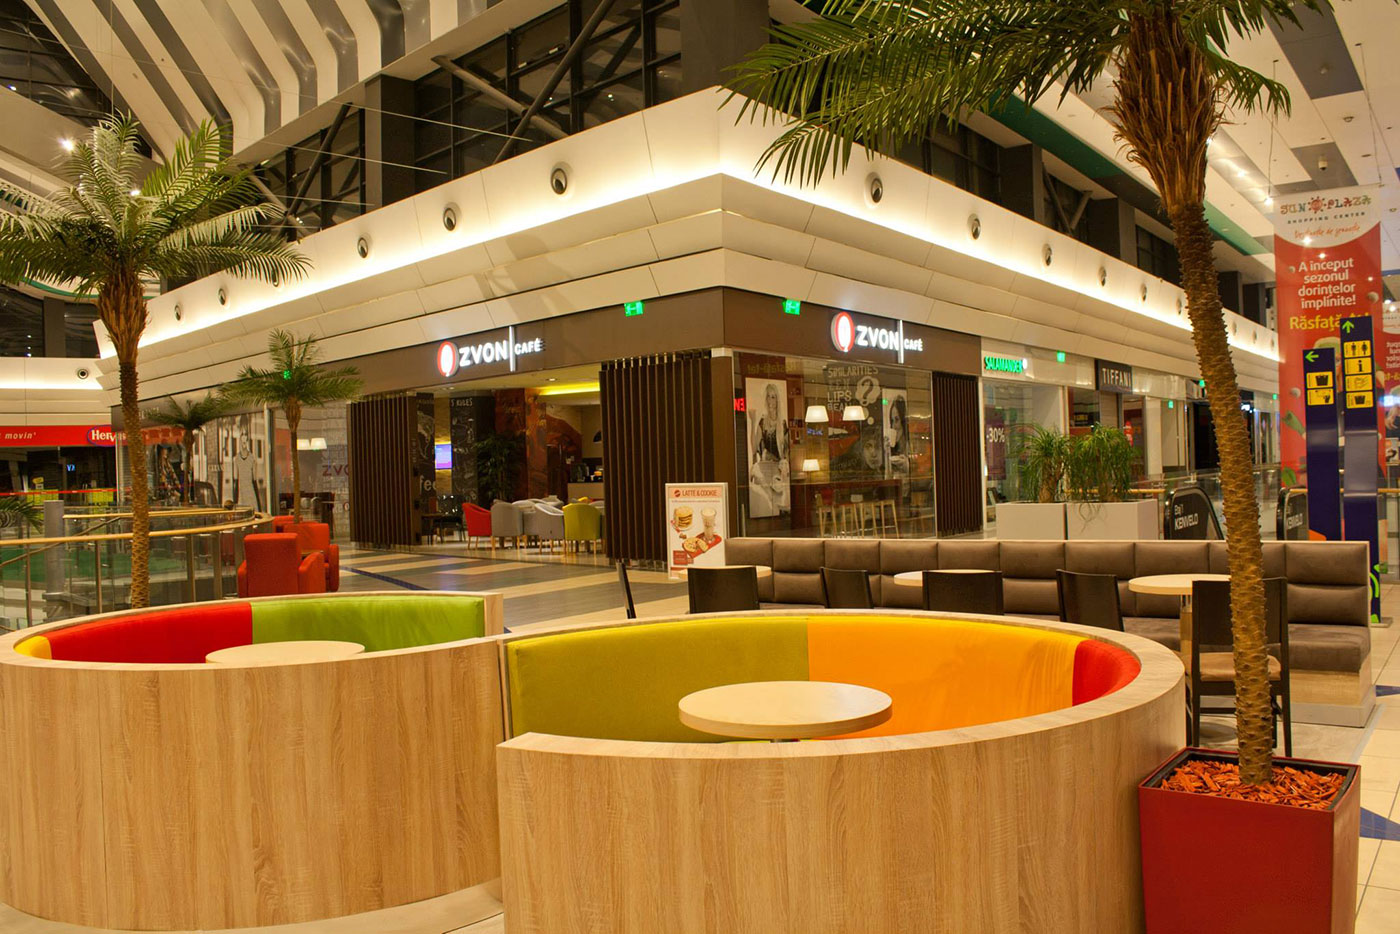 Zvon Café Sun Plaza